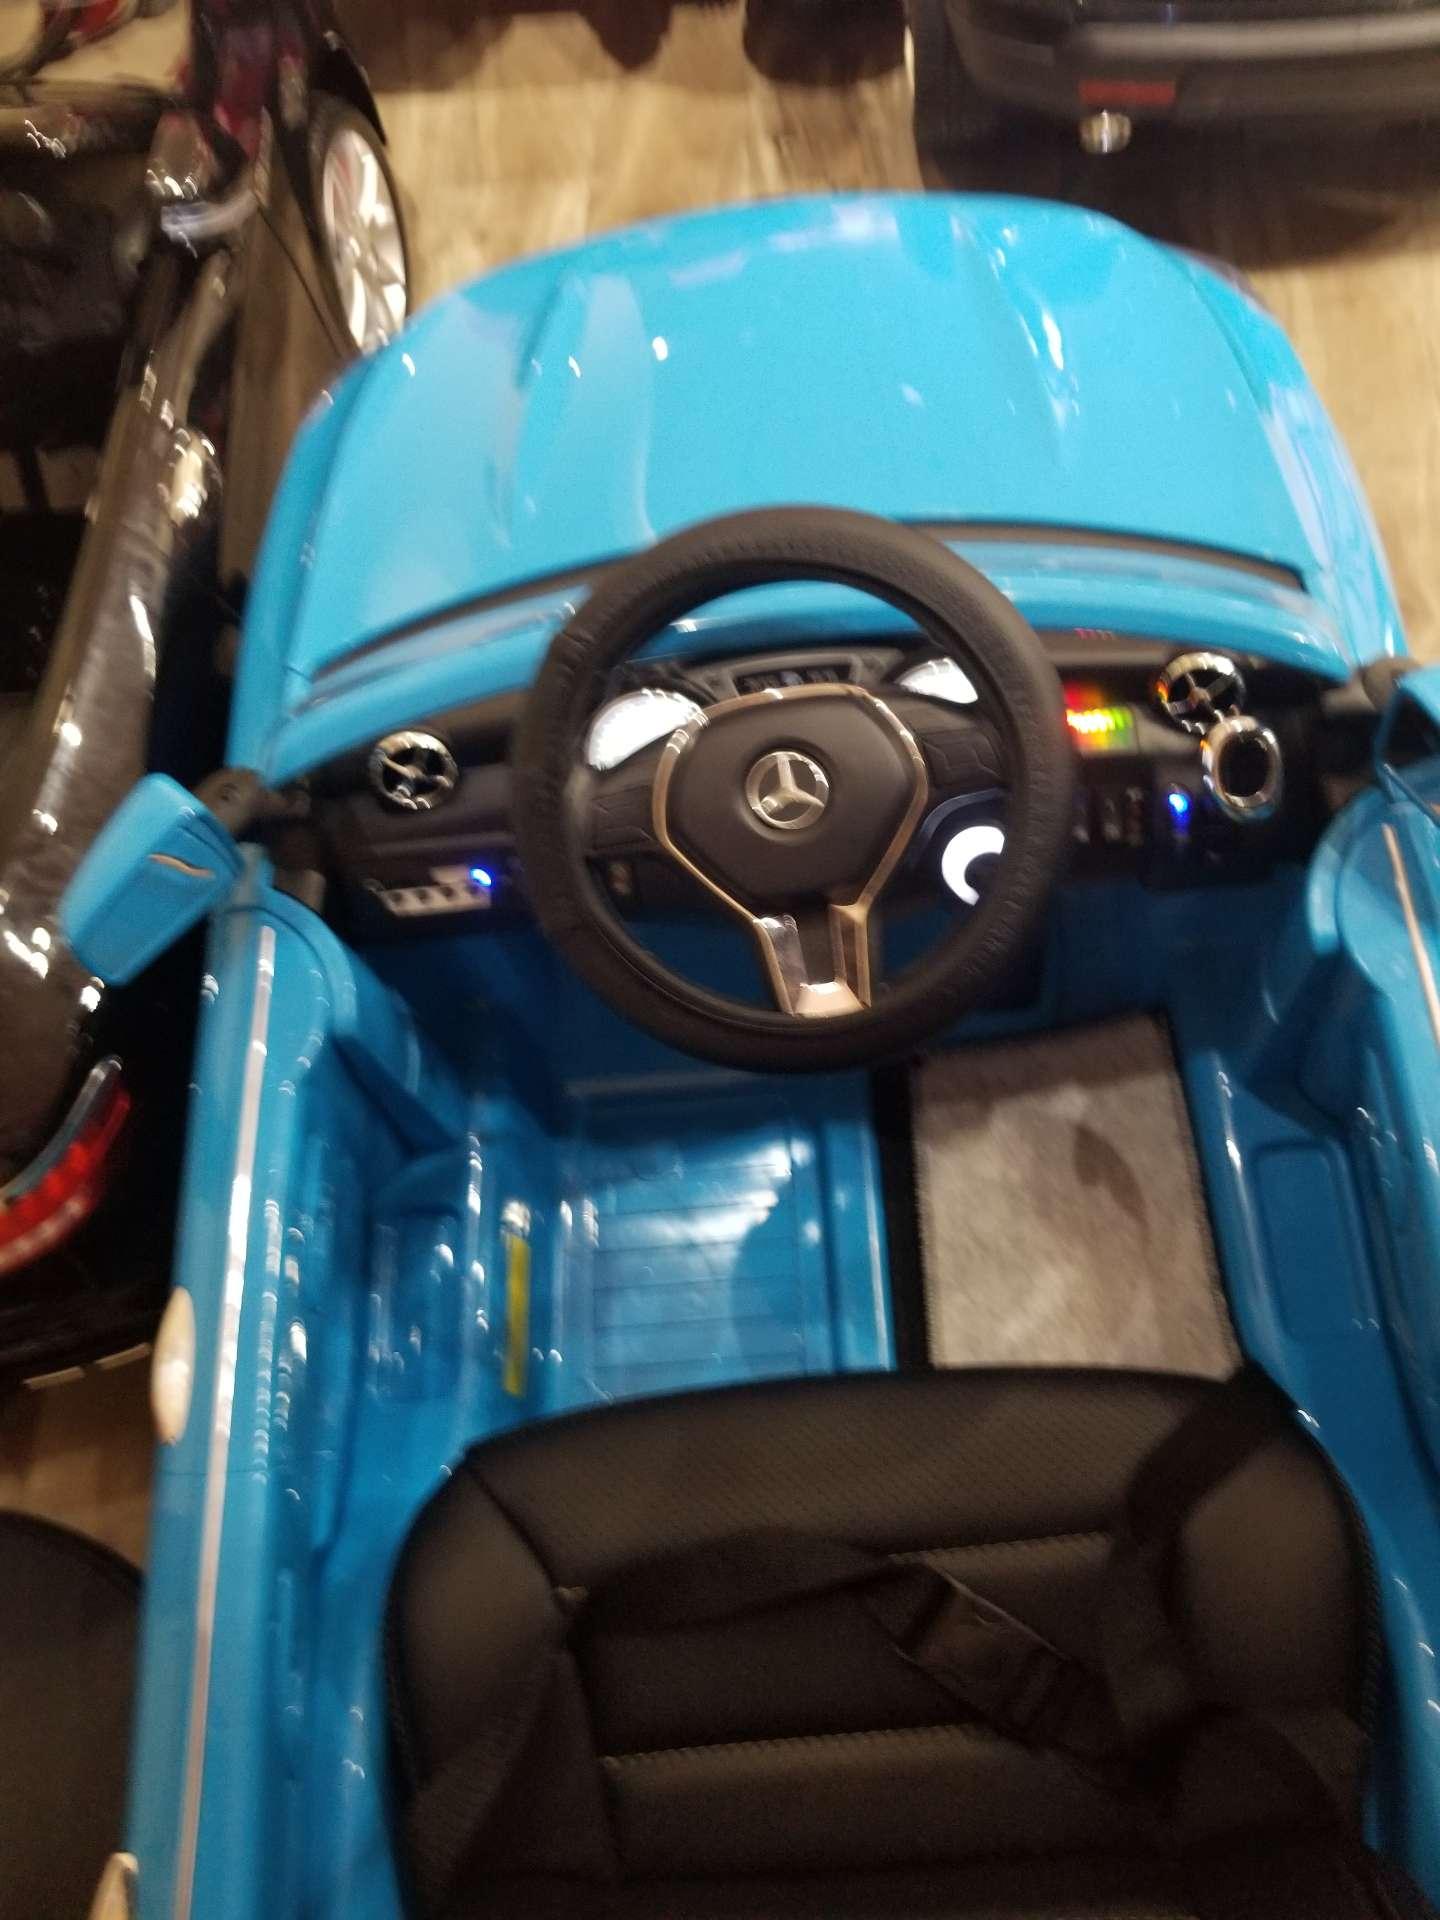 Photo Ride on cars w/remote control